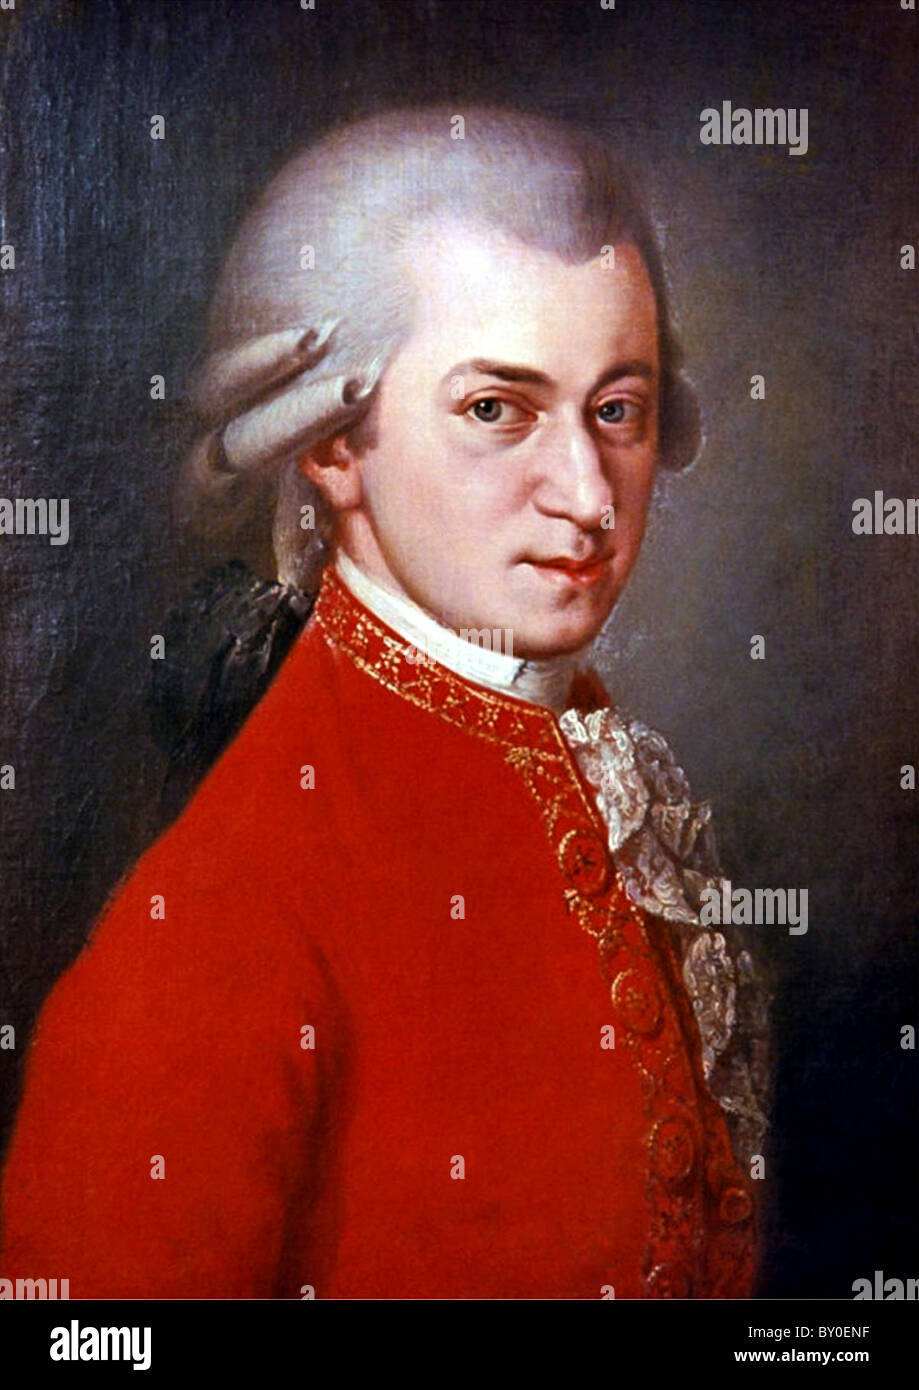 Mozart, Komponist Wolfgang Amadeus Mozart Stockbild